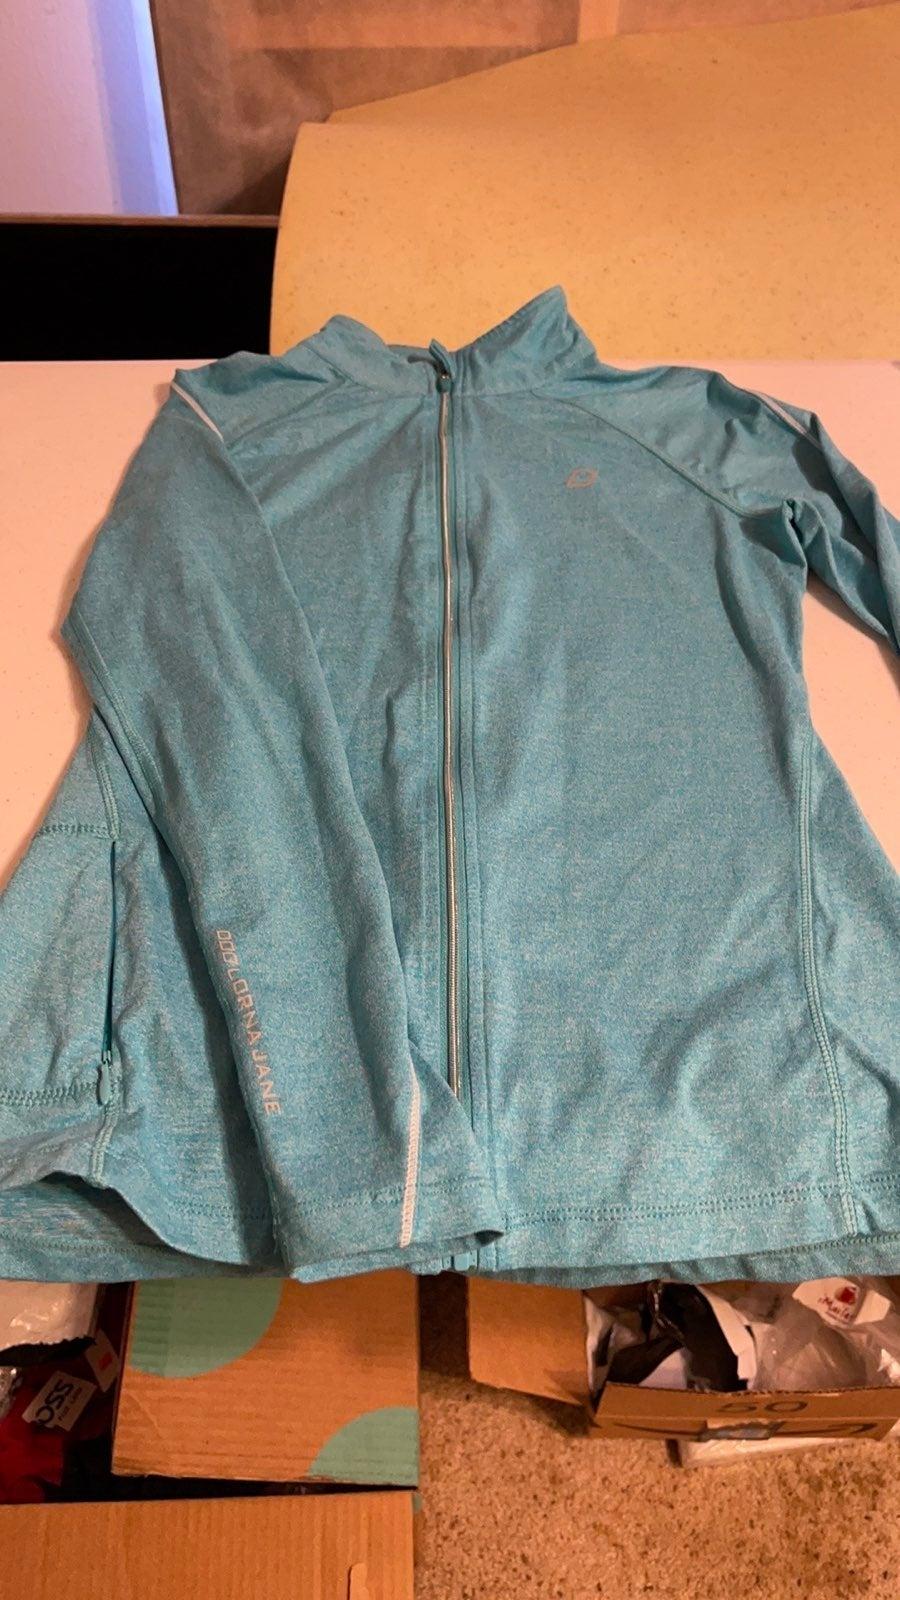 Women's Lorna Jane workout jacket